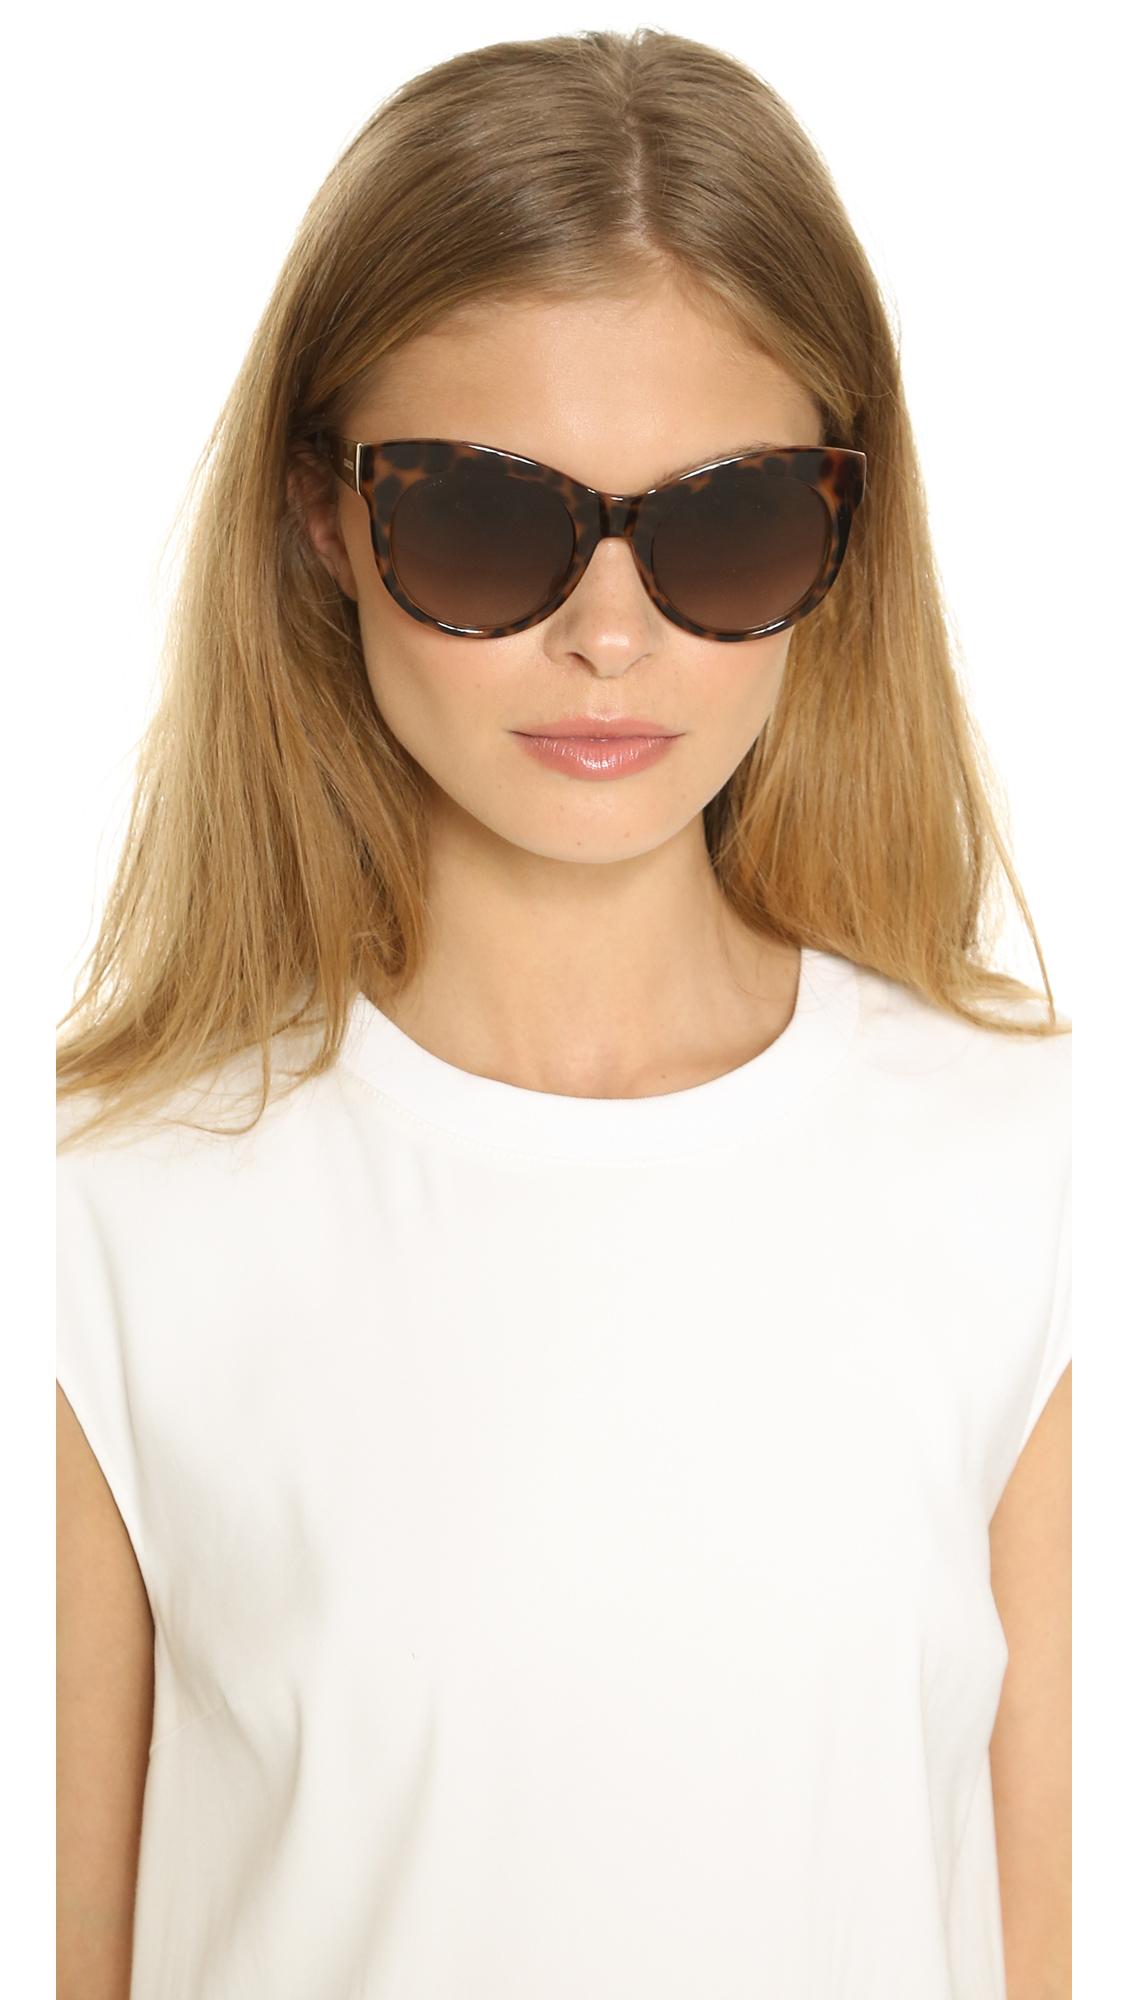 6116952faa Lyst - Gucci Floral Leopard Sunglasses